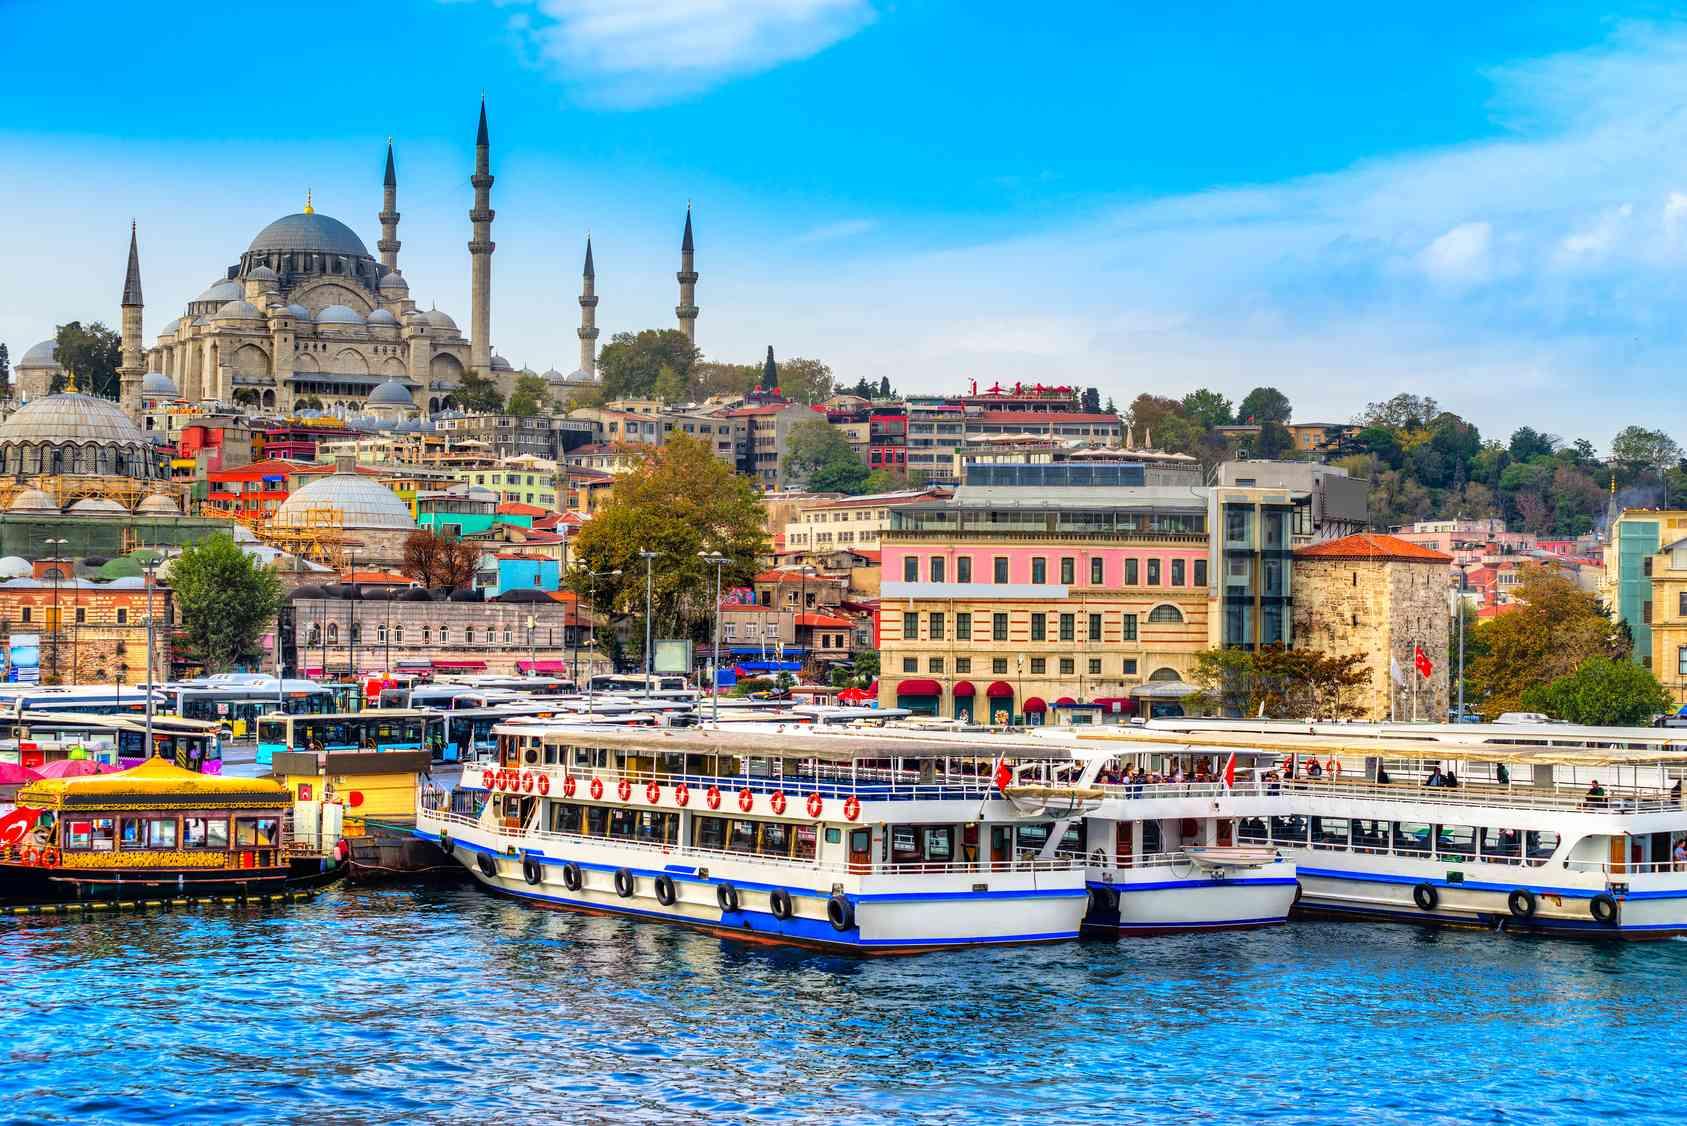 turquie decouverte d istanbul